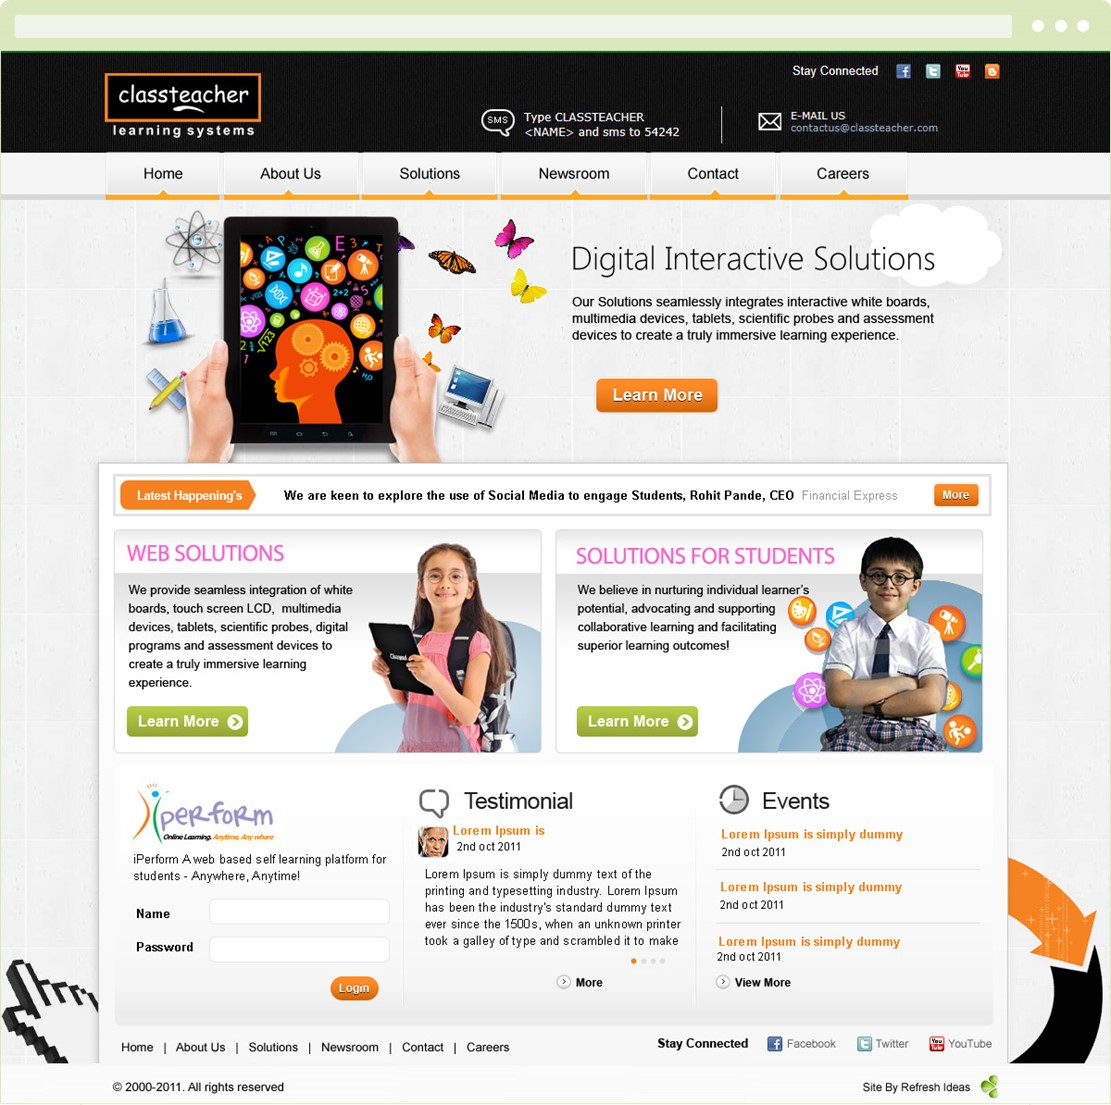 Classteacher Learning Systems